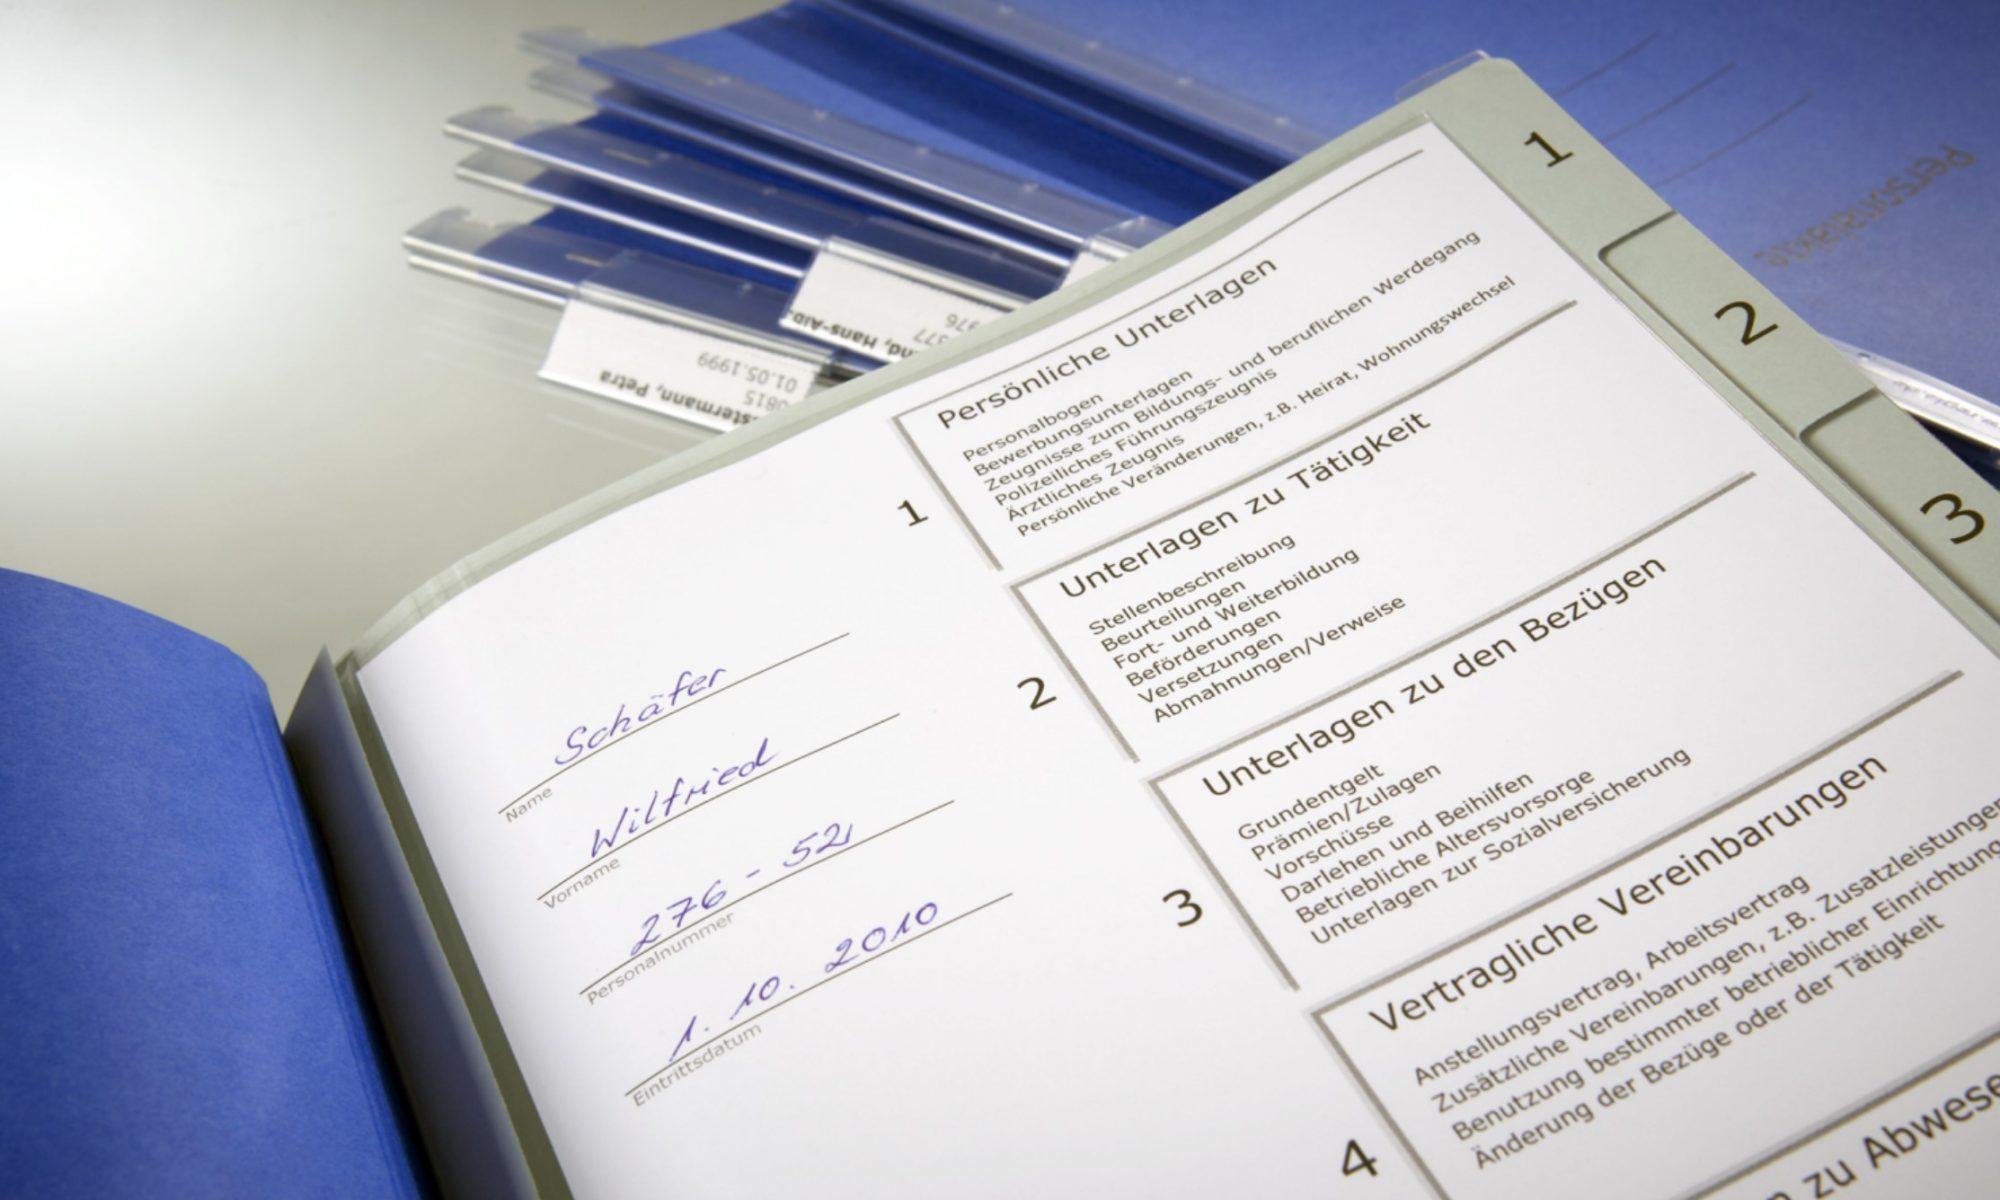 Peter Riehm Organisationssysteme